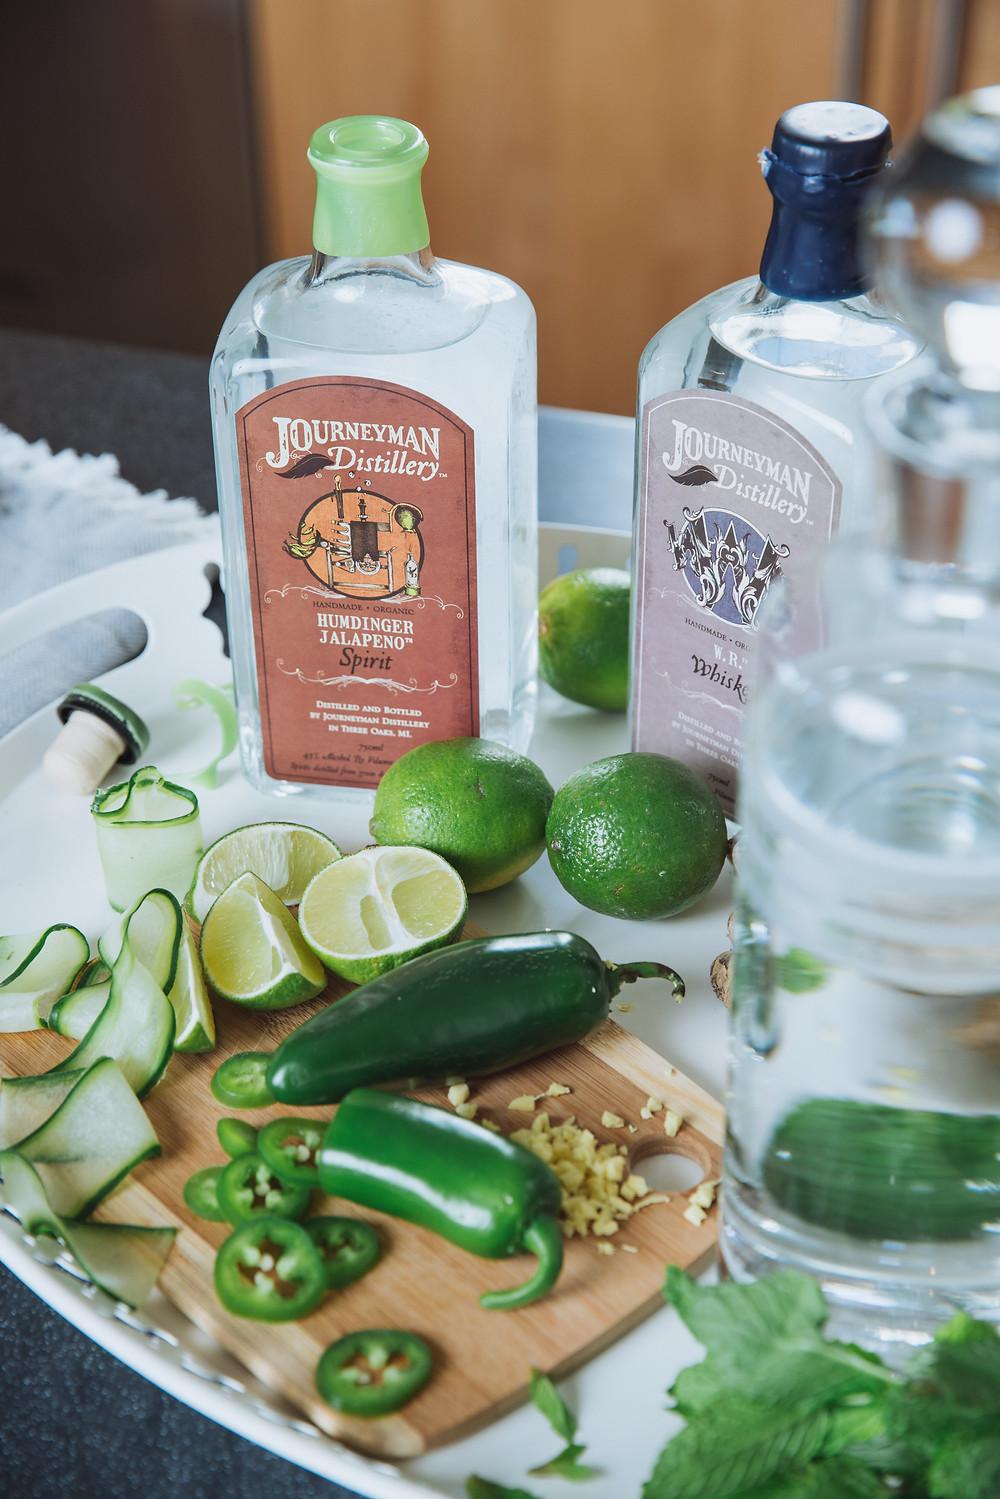 Spicy Keto cocktail recipe with Journeyman Humdinger Jalapeno